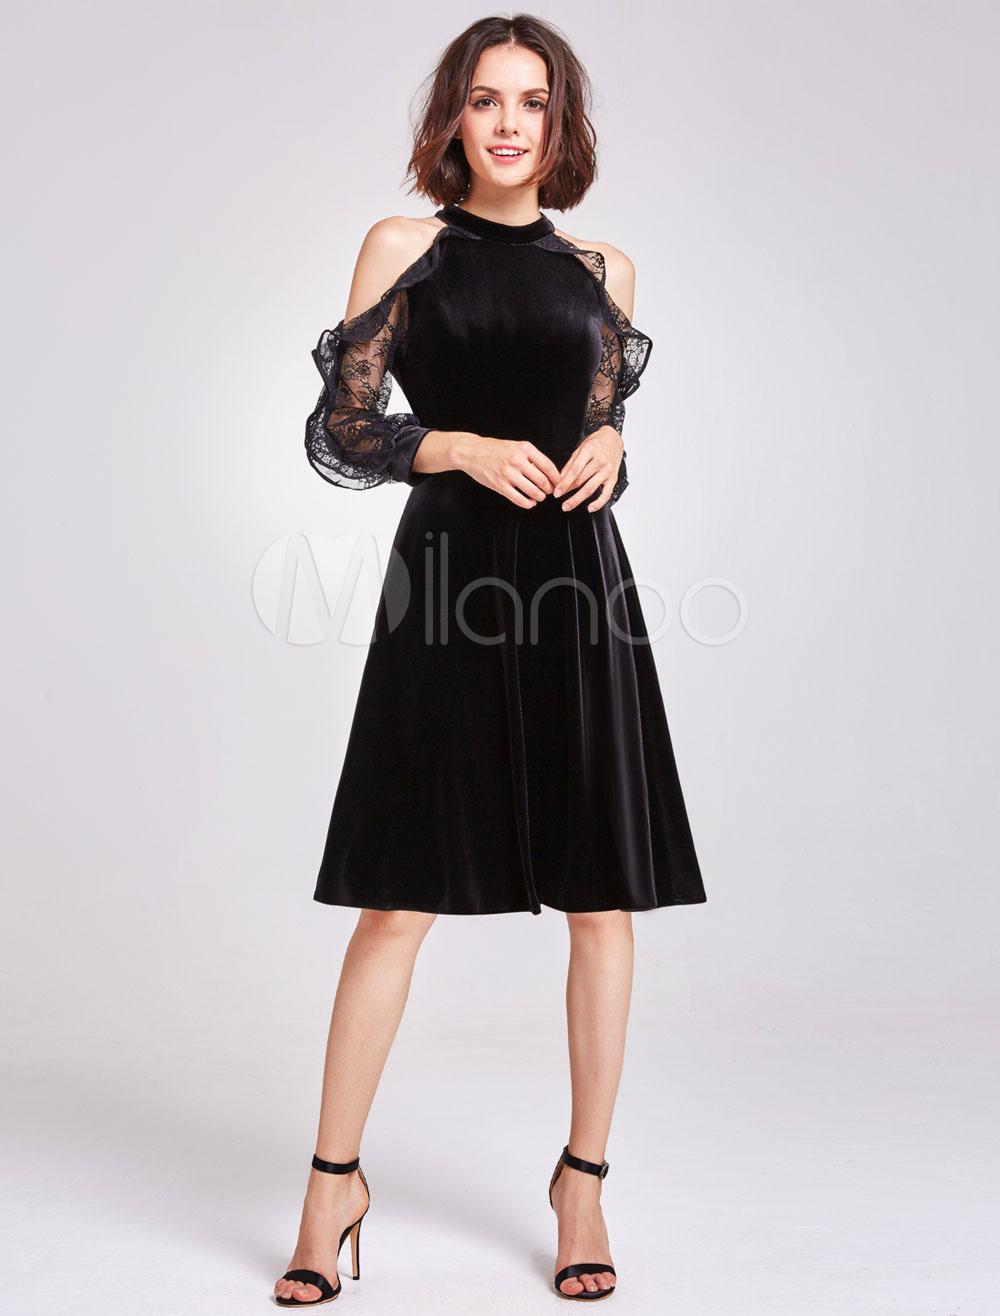 Little Black Dresses Short Velvet Halter Cold Shoulder Long Sleeve Illusion Knee Length Cocktail Dresses